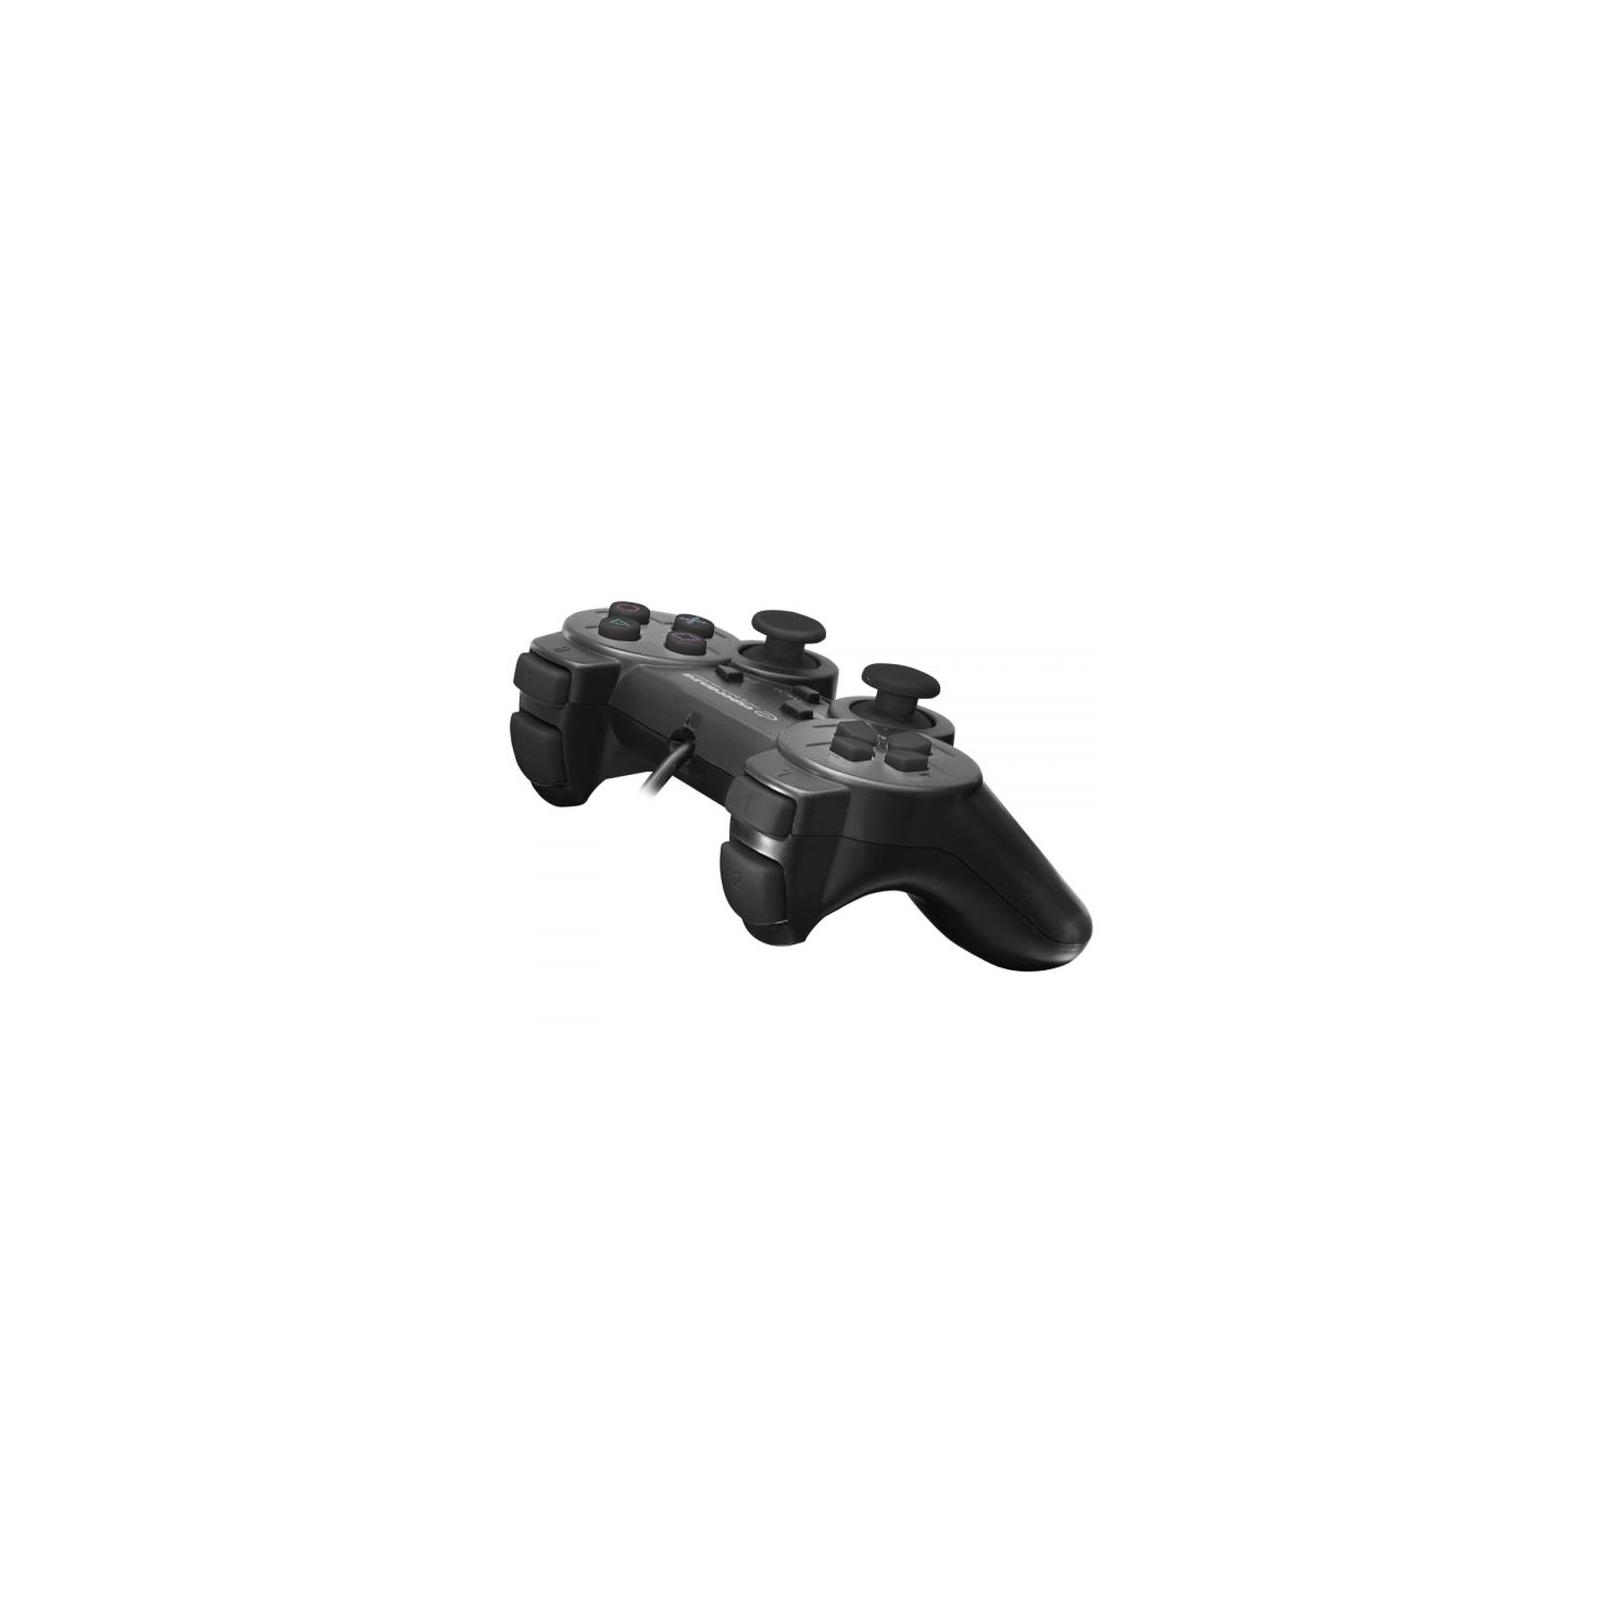 Геймпад Esperanza Trooper PS3/PC Black (EGG107K) изображение 2